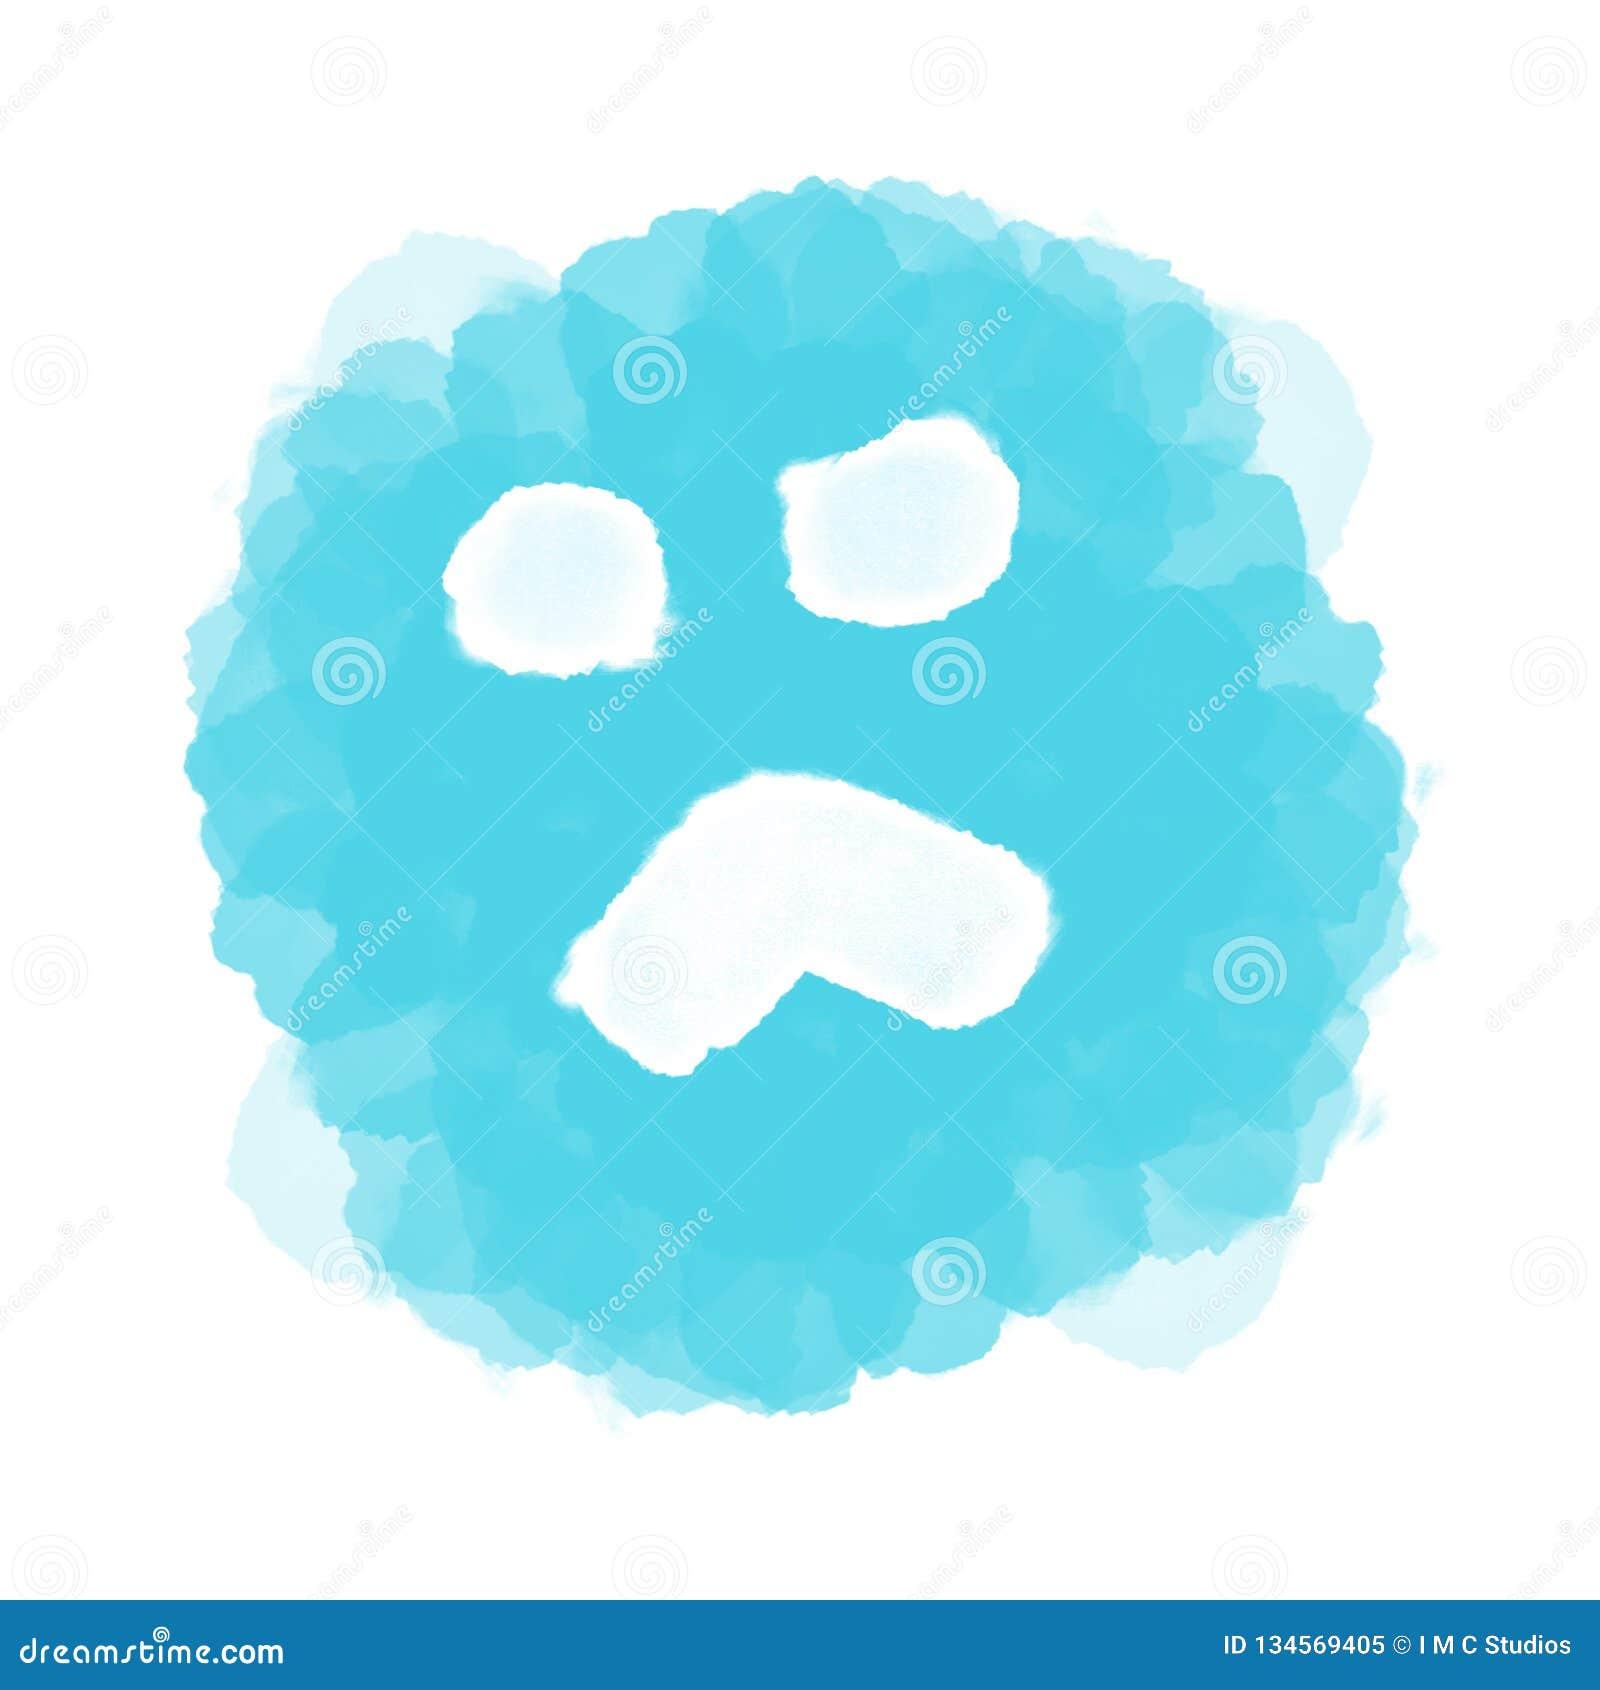 Abstract blue sad emoji/emoticon on white